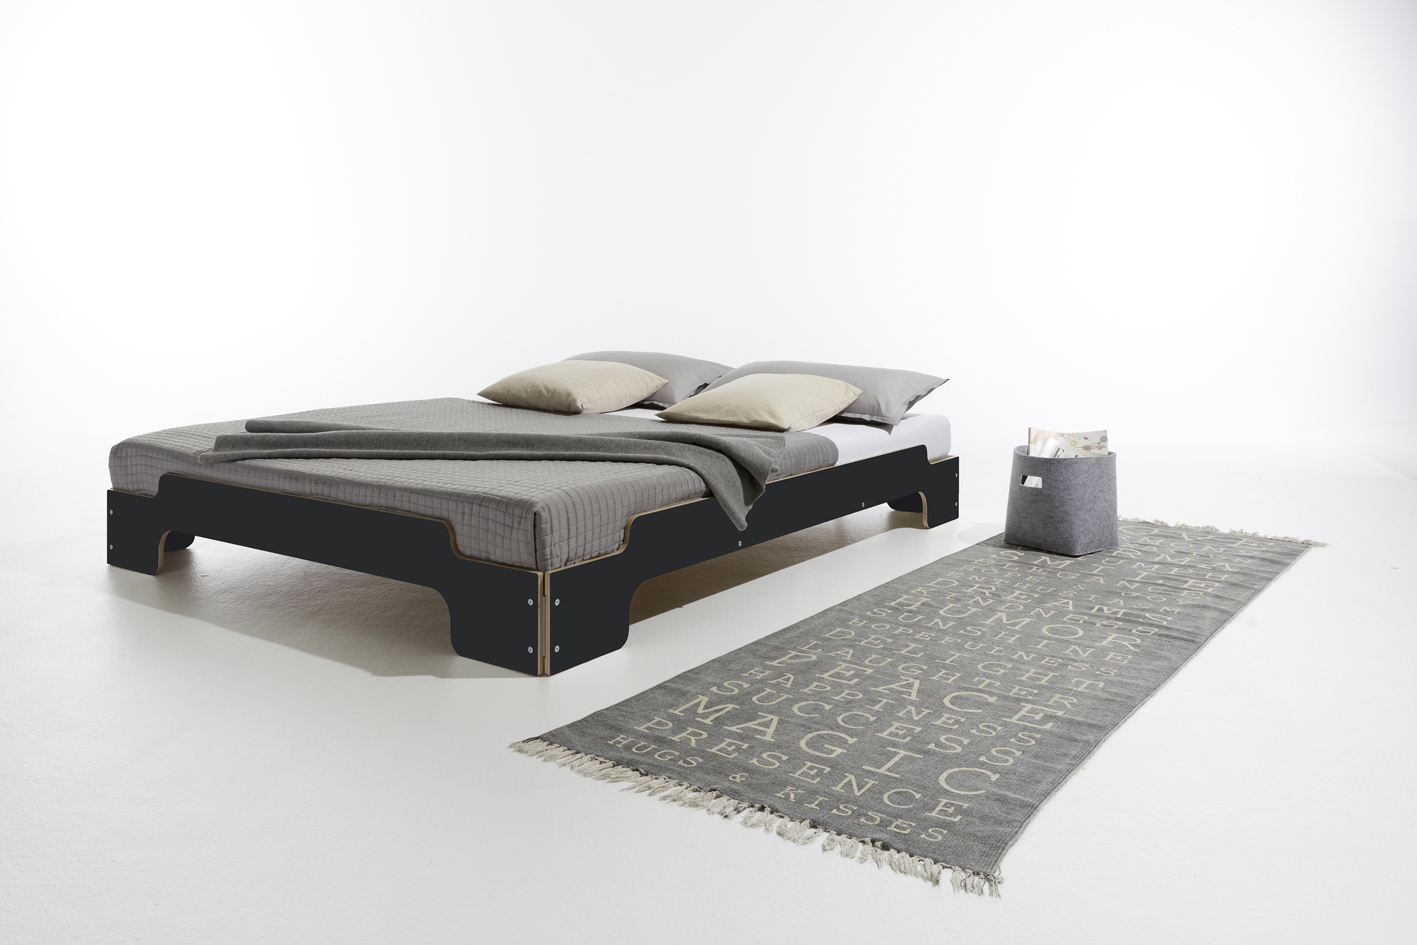 Stapelliege Komfort HPL schwarz matt Detailbild 1